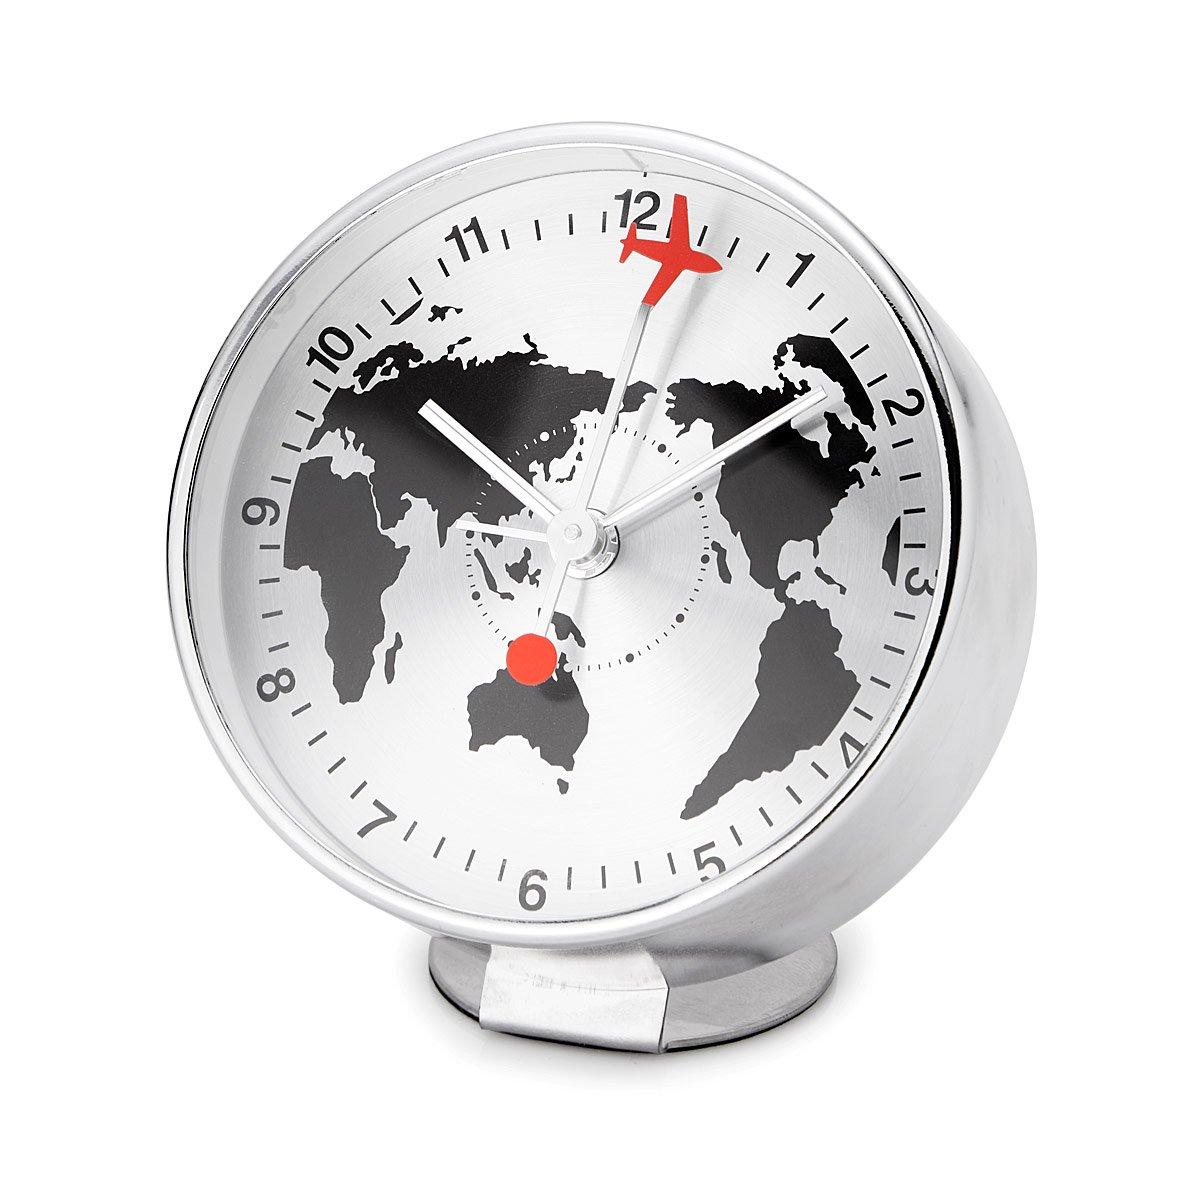 around-the-world-alarm-clock